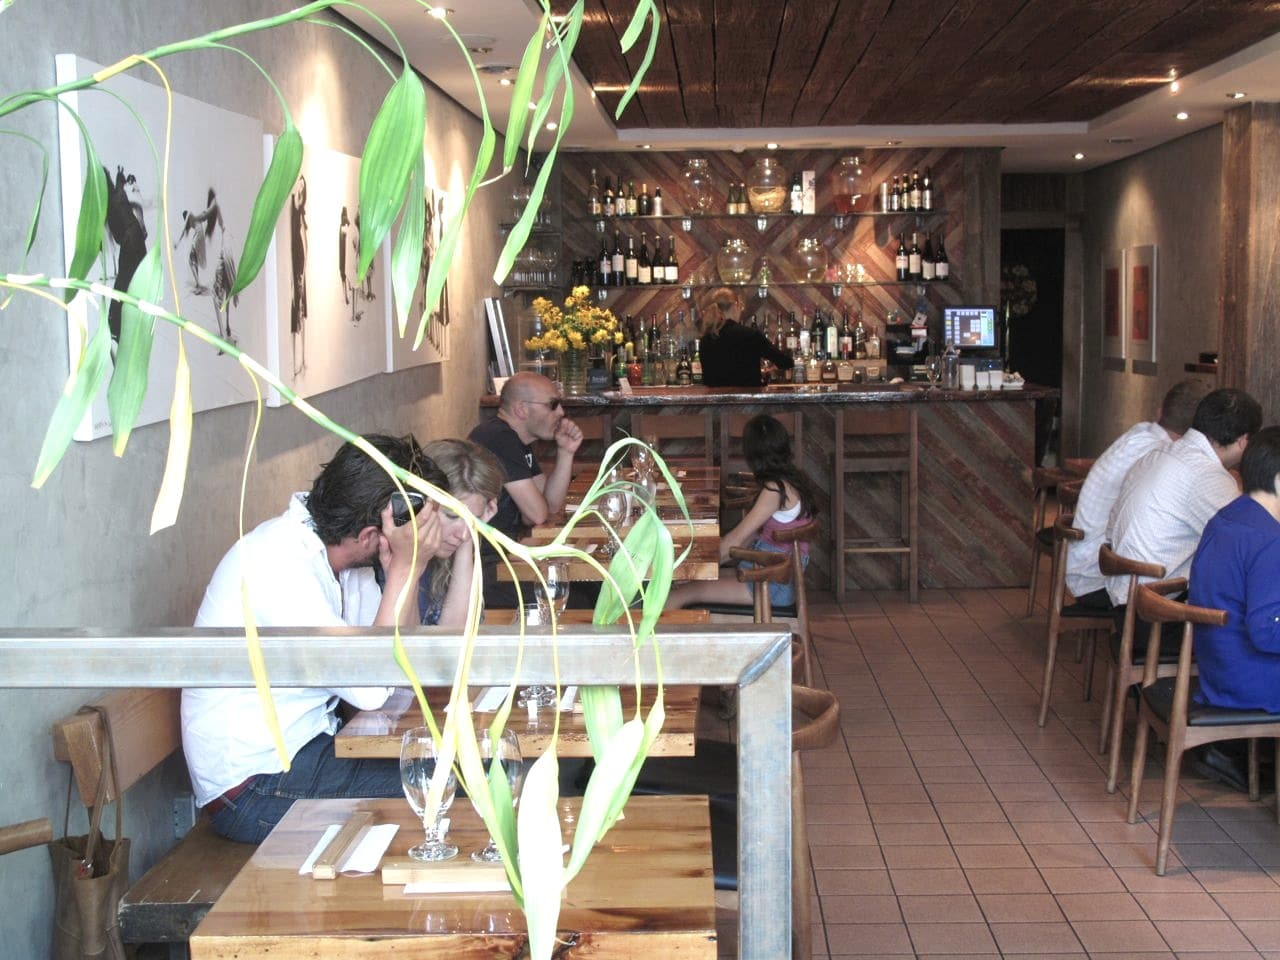 Yorkville Restaurants: Koko Share Bar offers playful Korean and Japanese dishes.